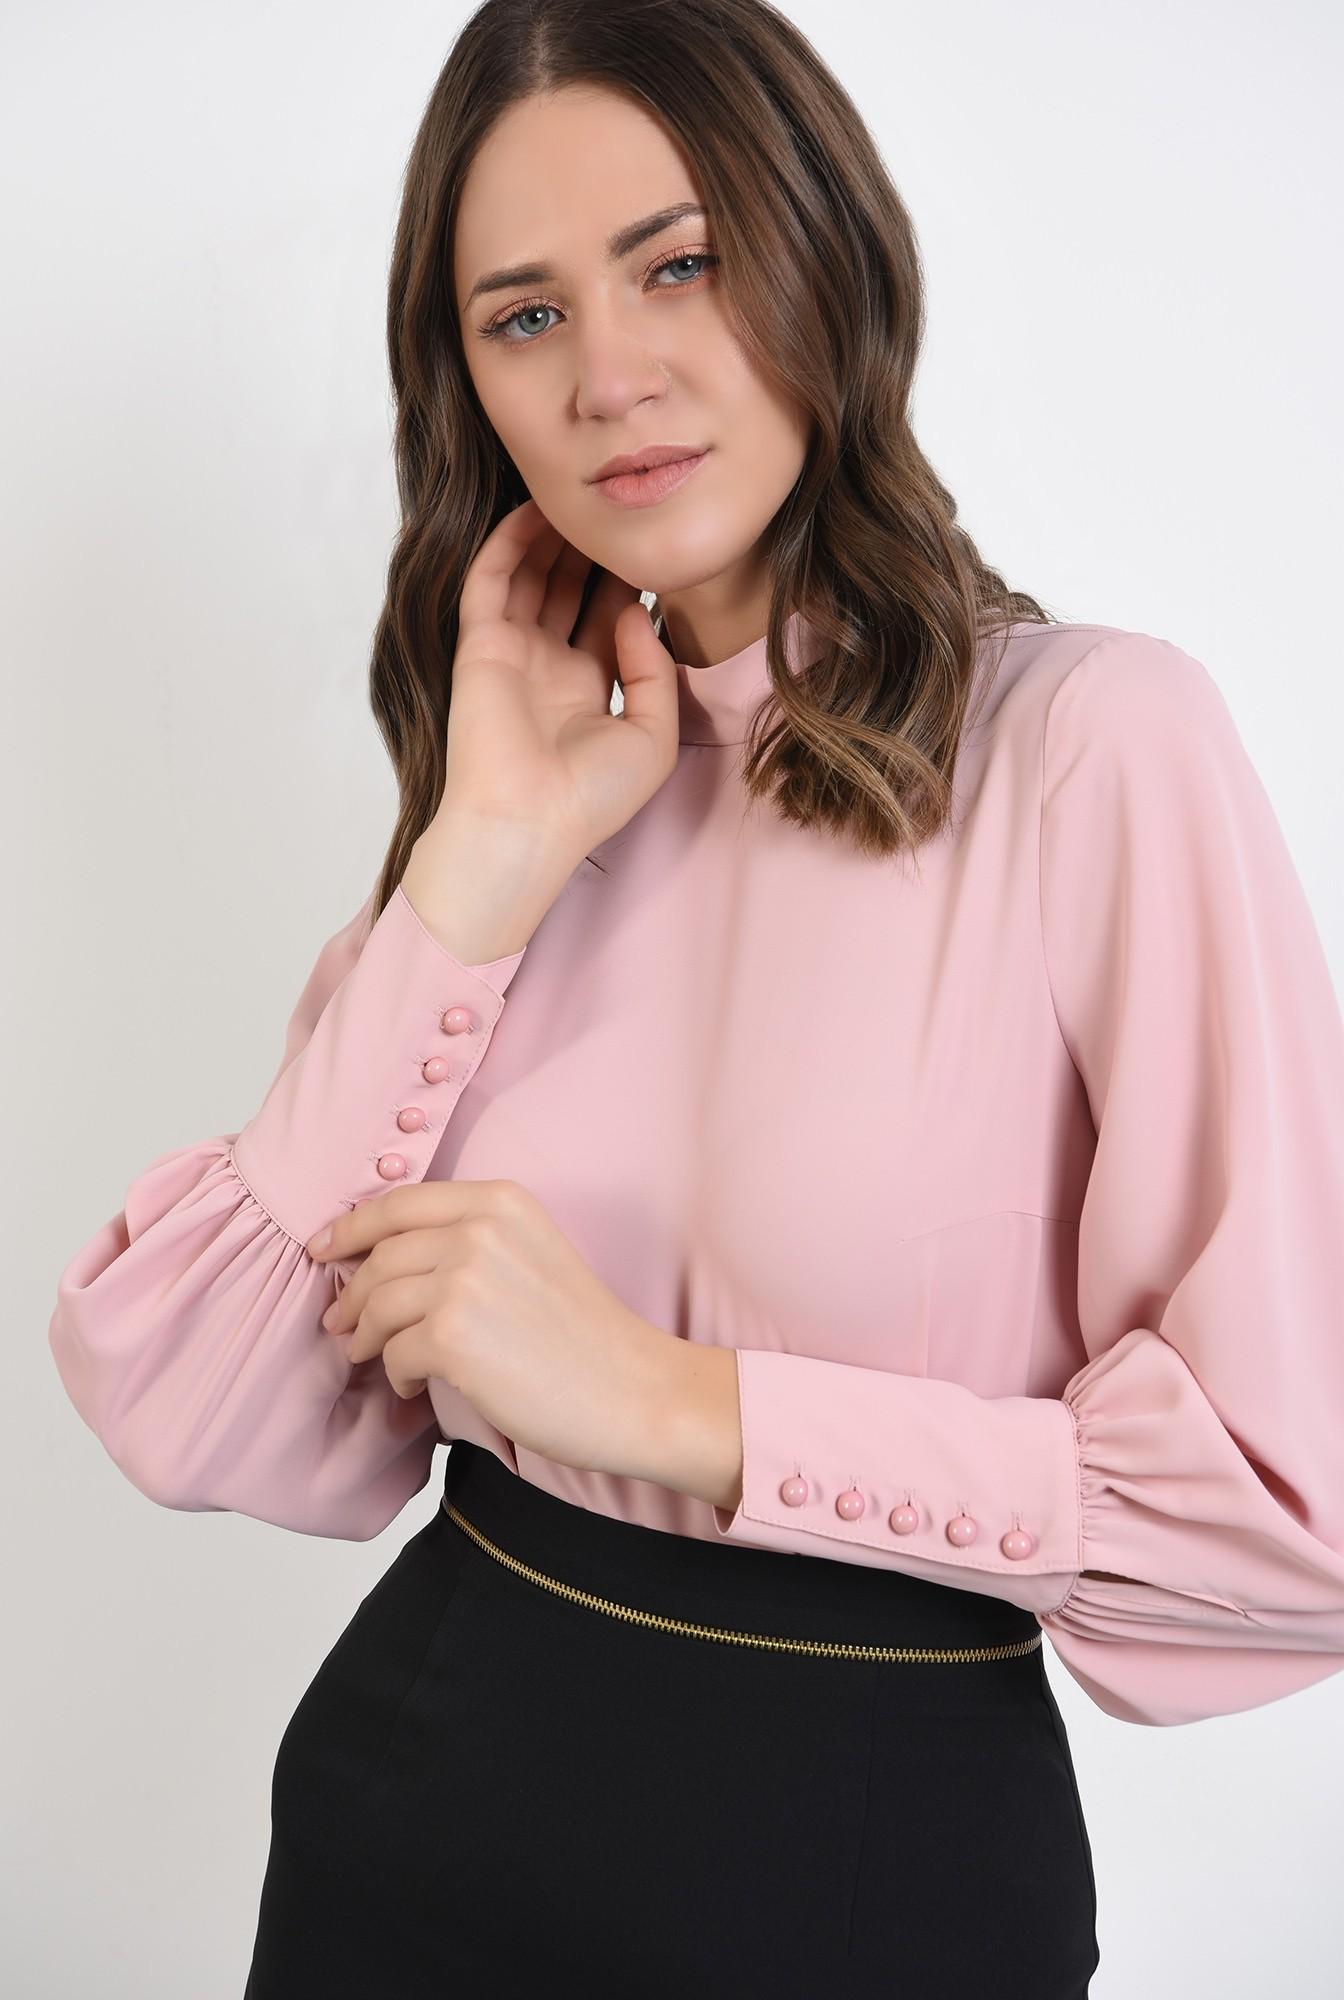 2 -  bluza office, roz, guler perkins, maneci lungi, Poema